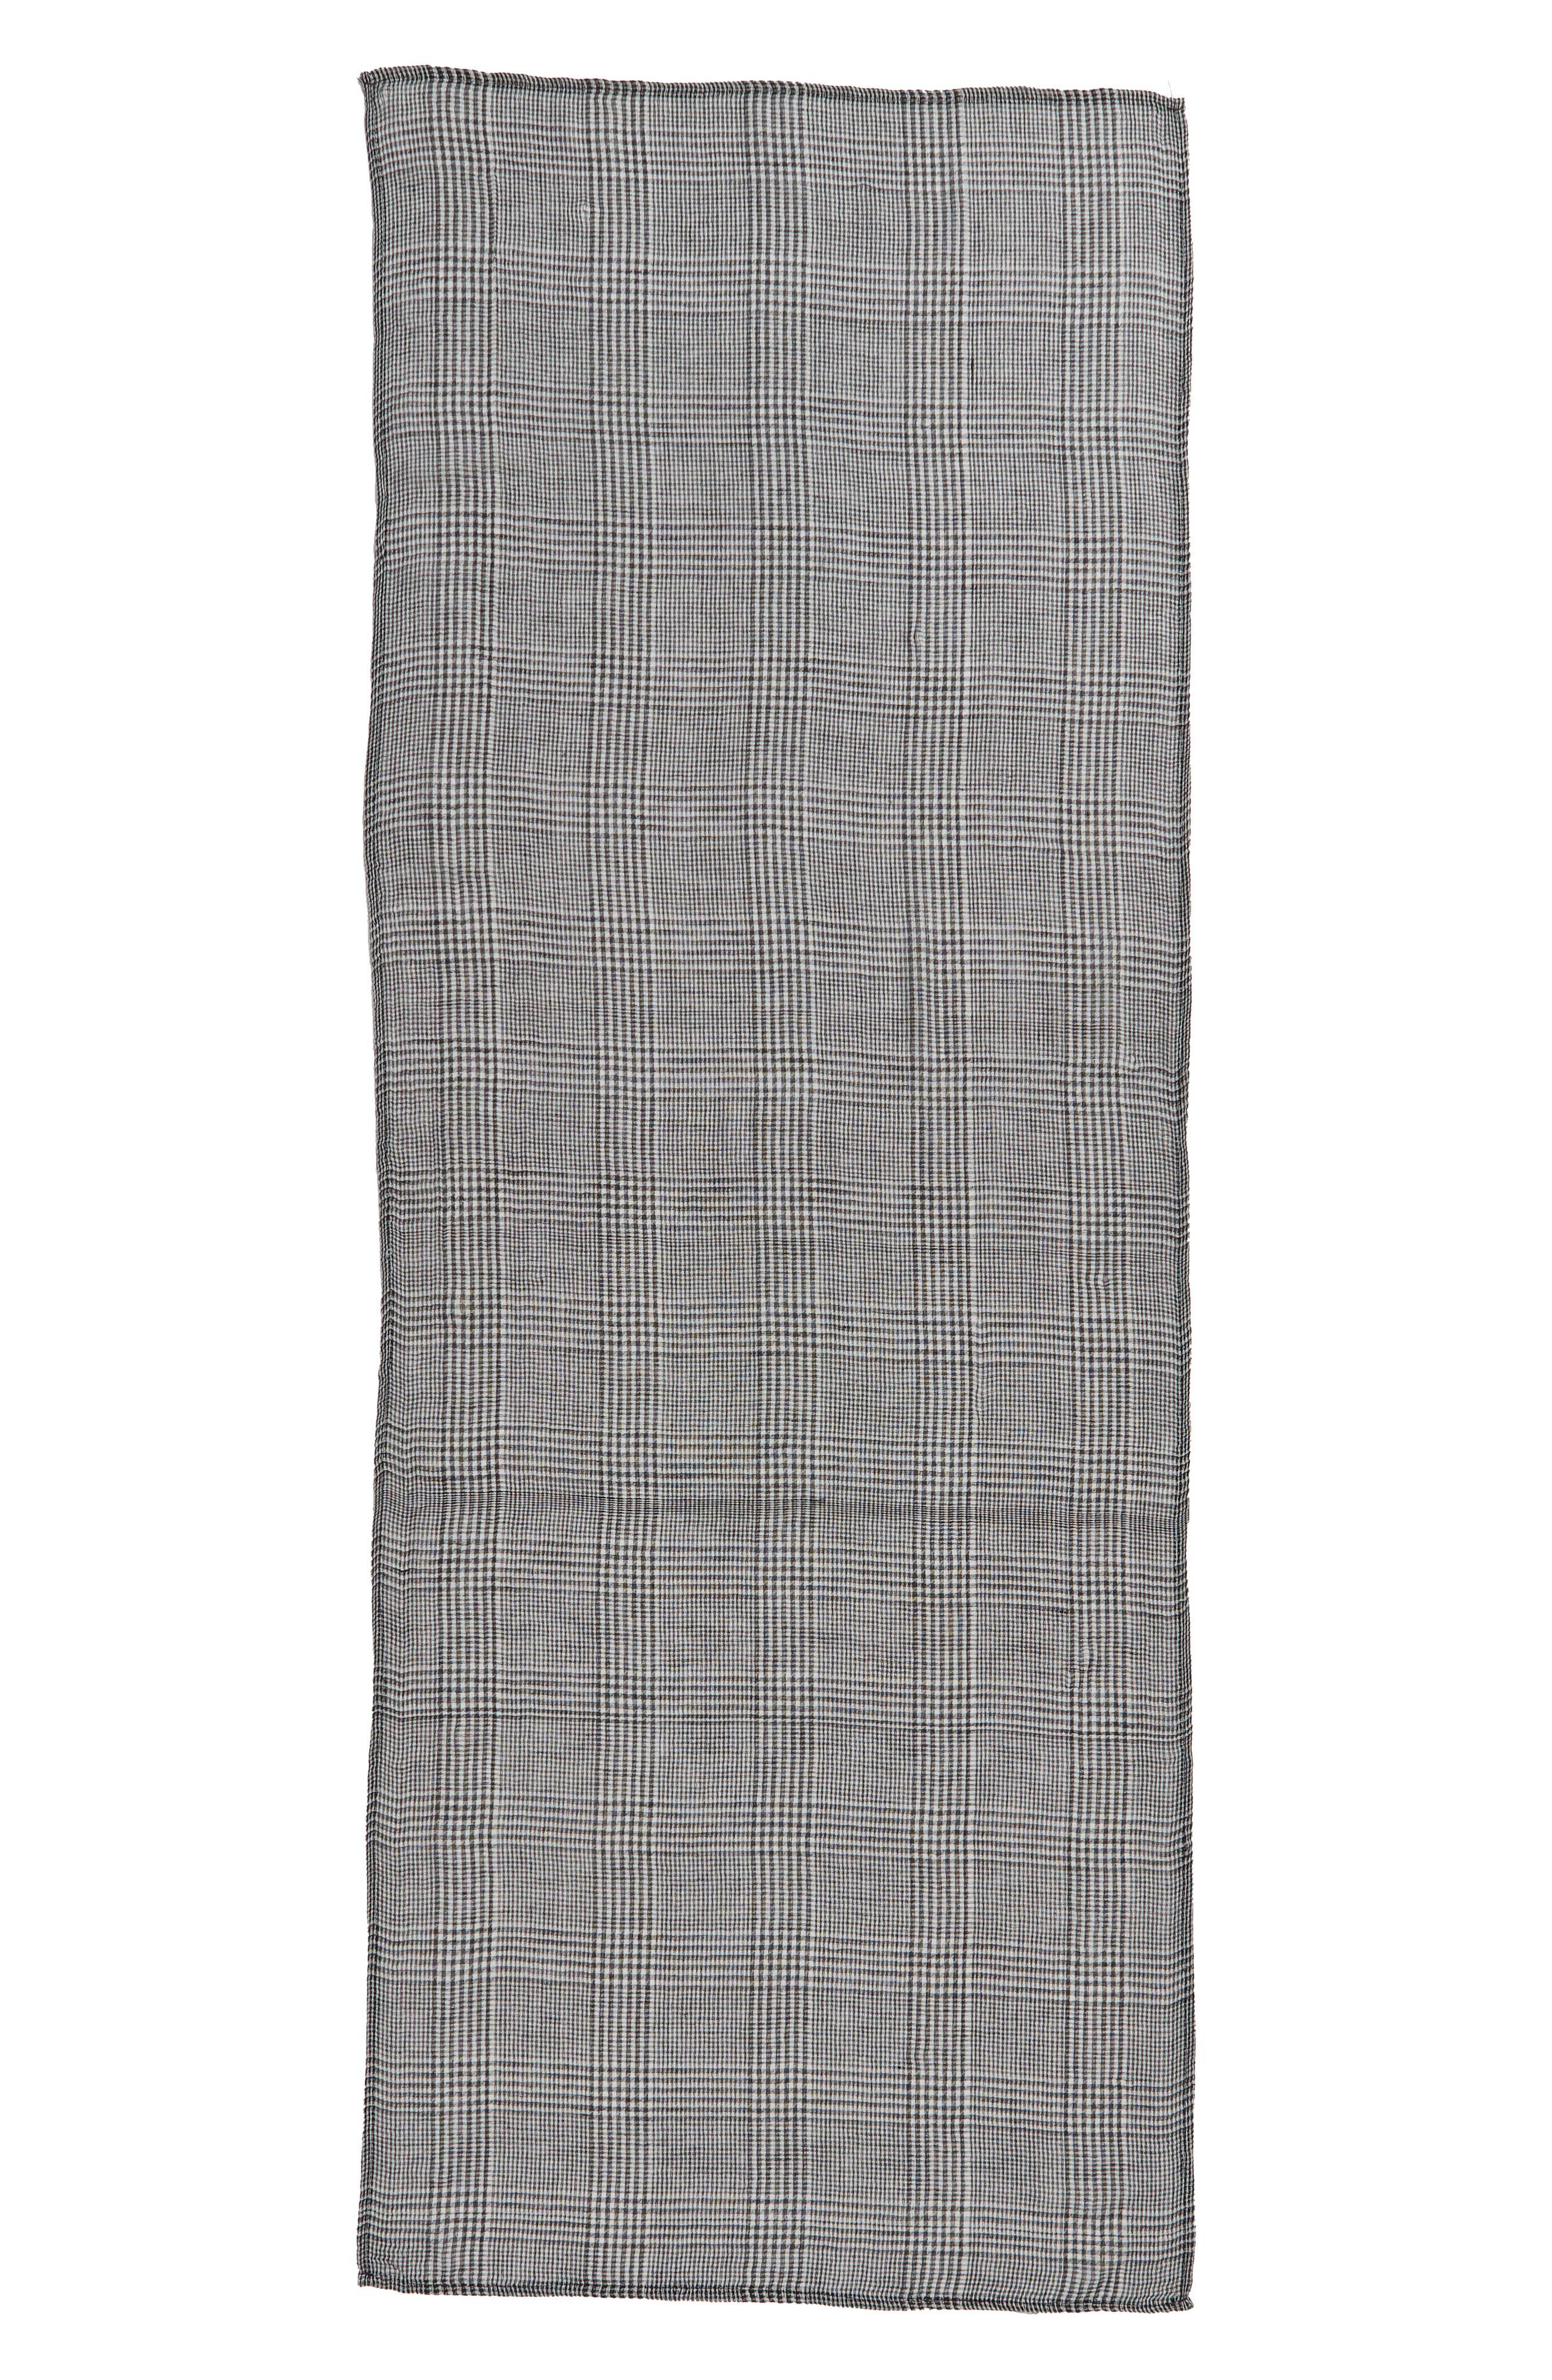 Menswear Plaid Oblong Scarf,                             Alternate thumbnail 3, color,                             020